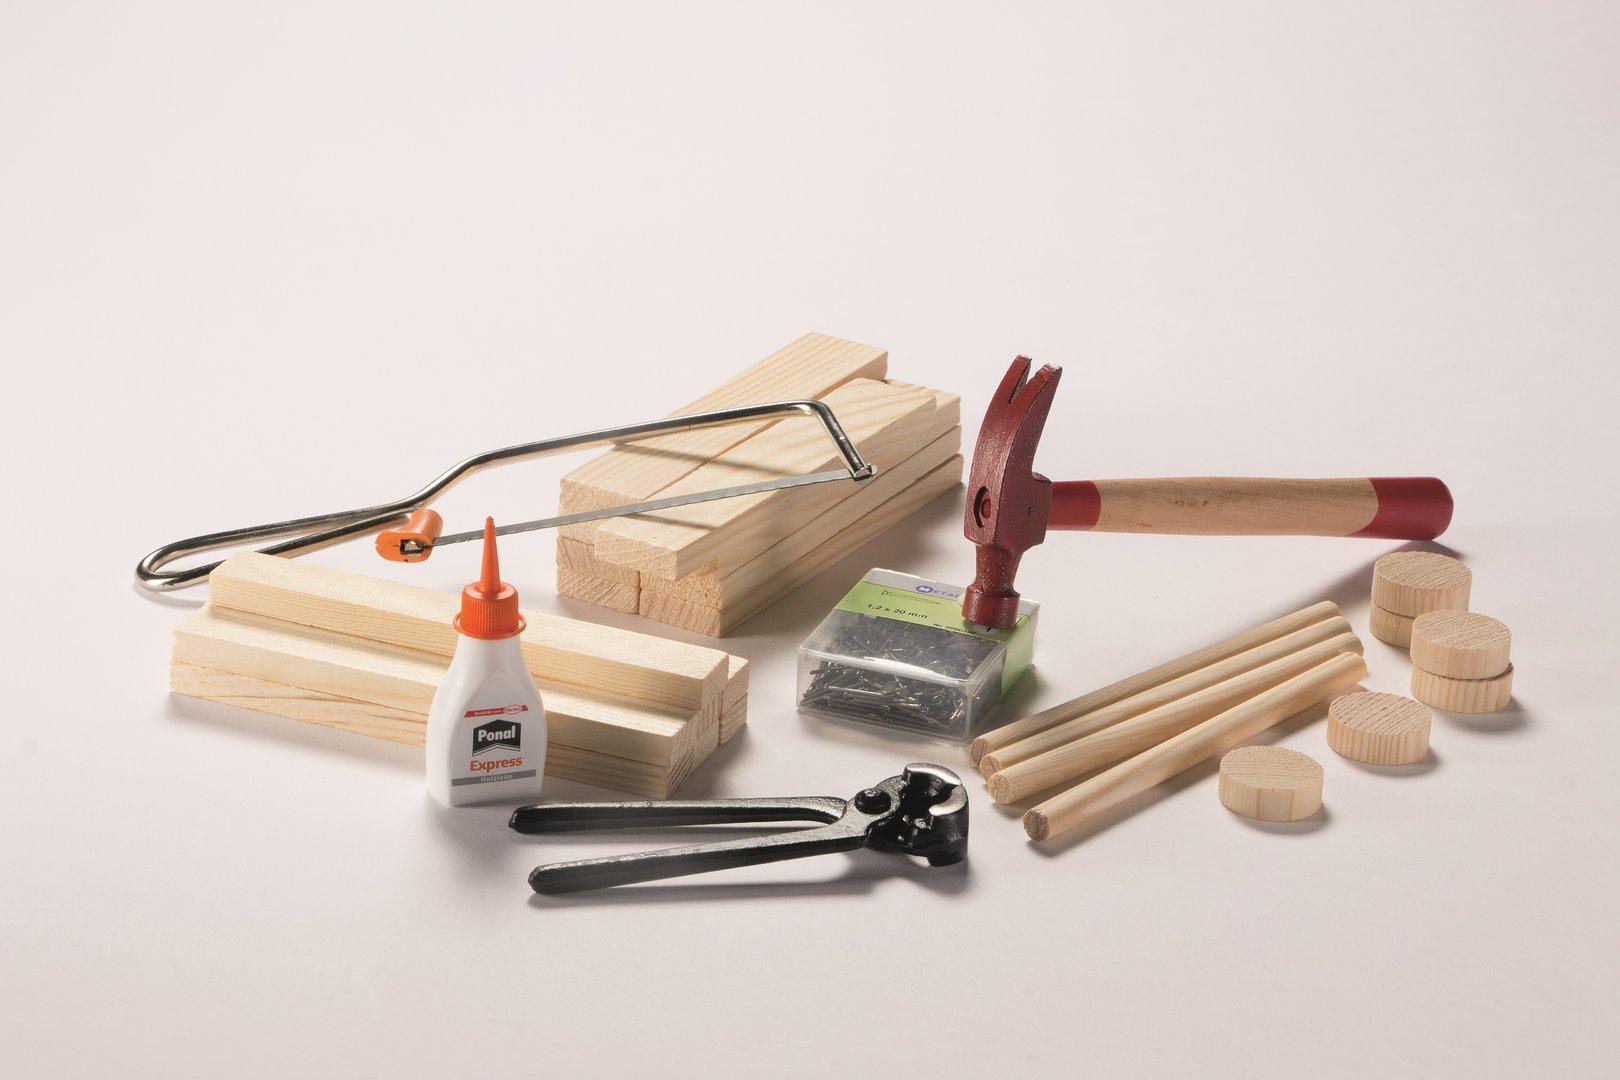 kit de construction en bois. Black Bedroom Furniture Sets. Home Design Ideas